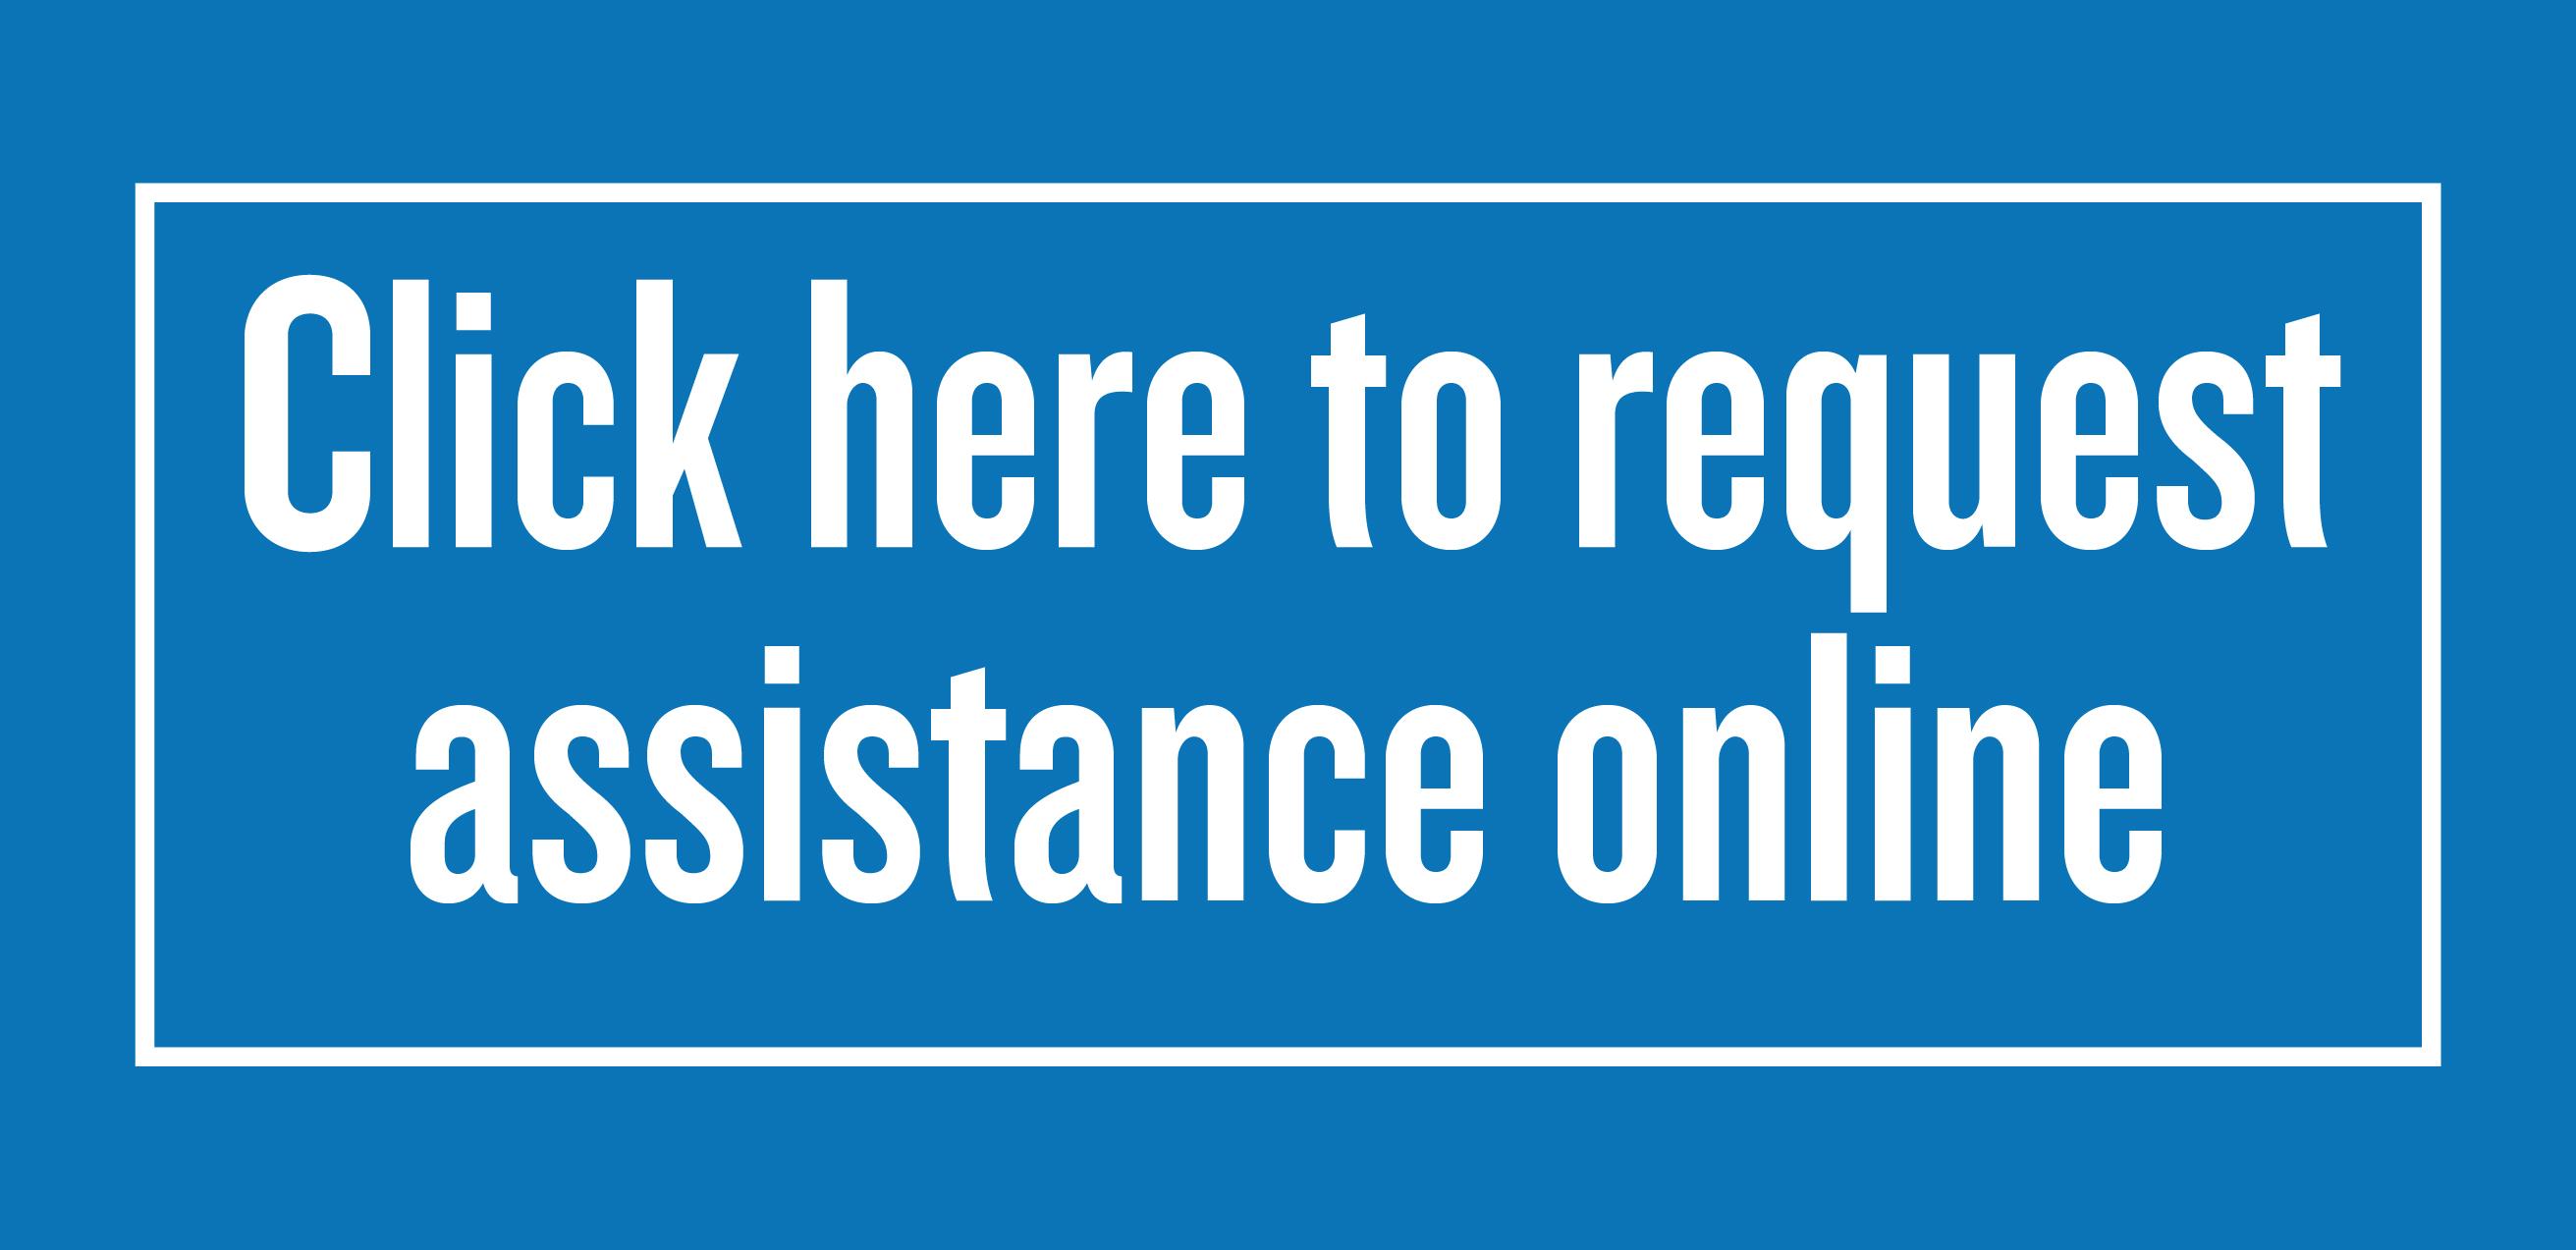 Request Assistance